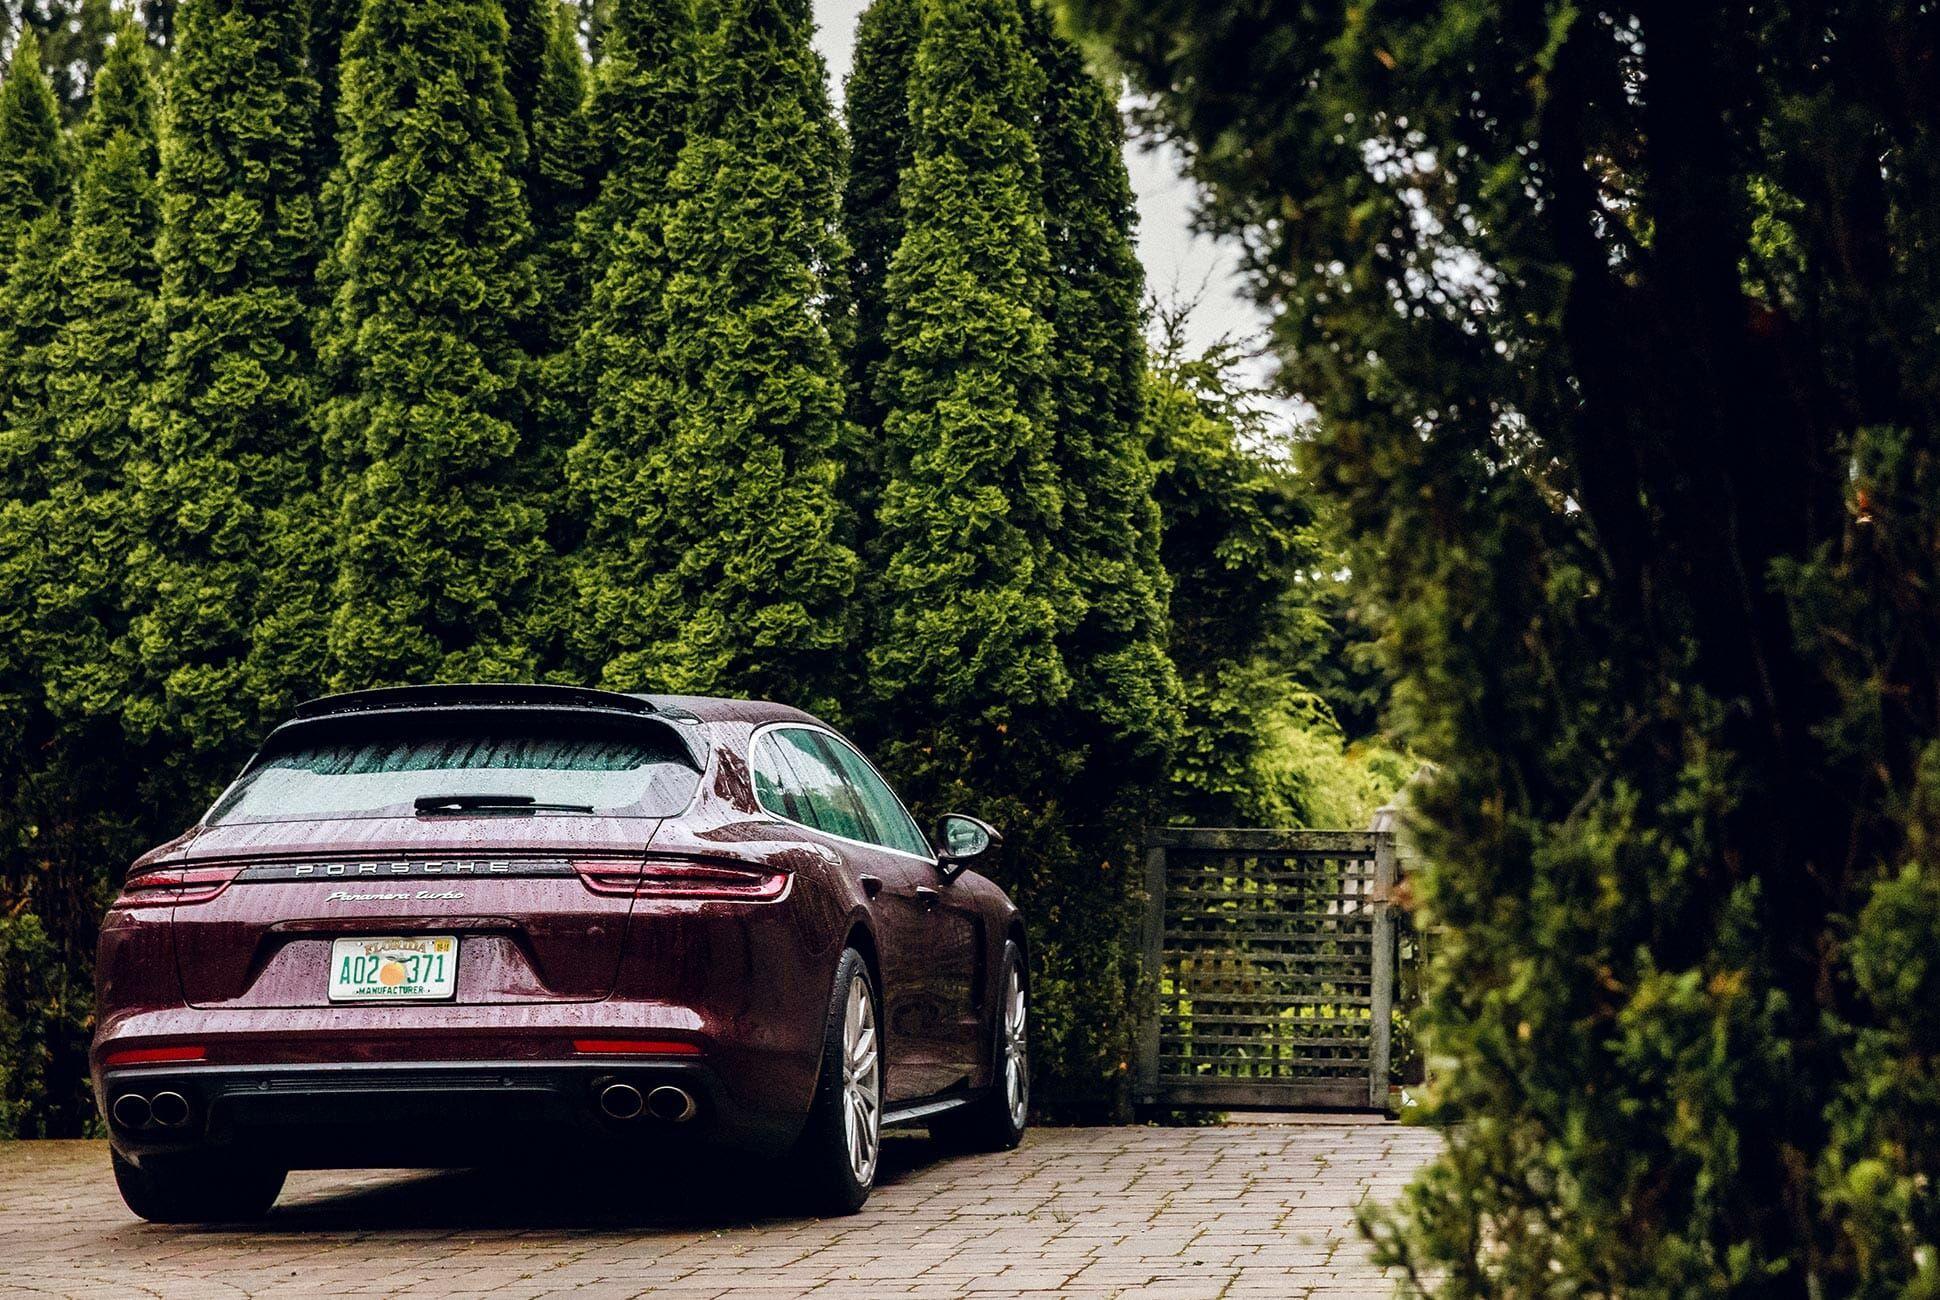 Porsche-Panamera-Turbo-Sport-Turismo-Review-gear-patrol-slide-12